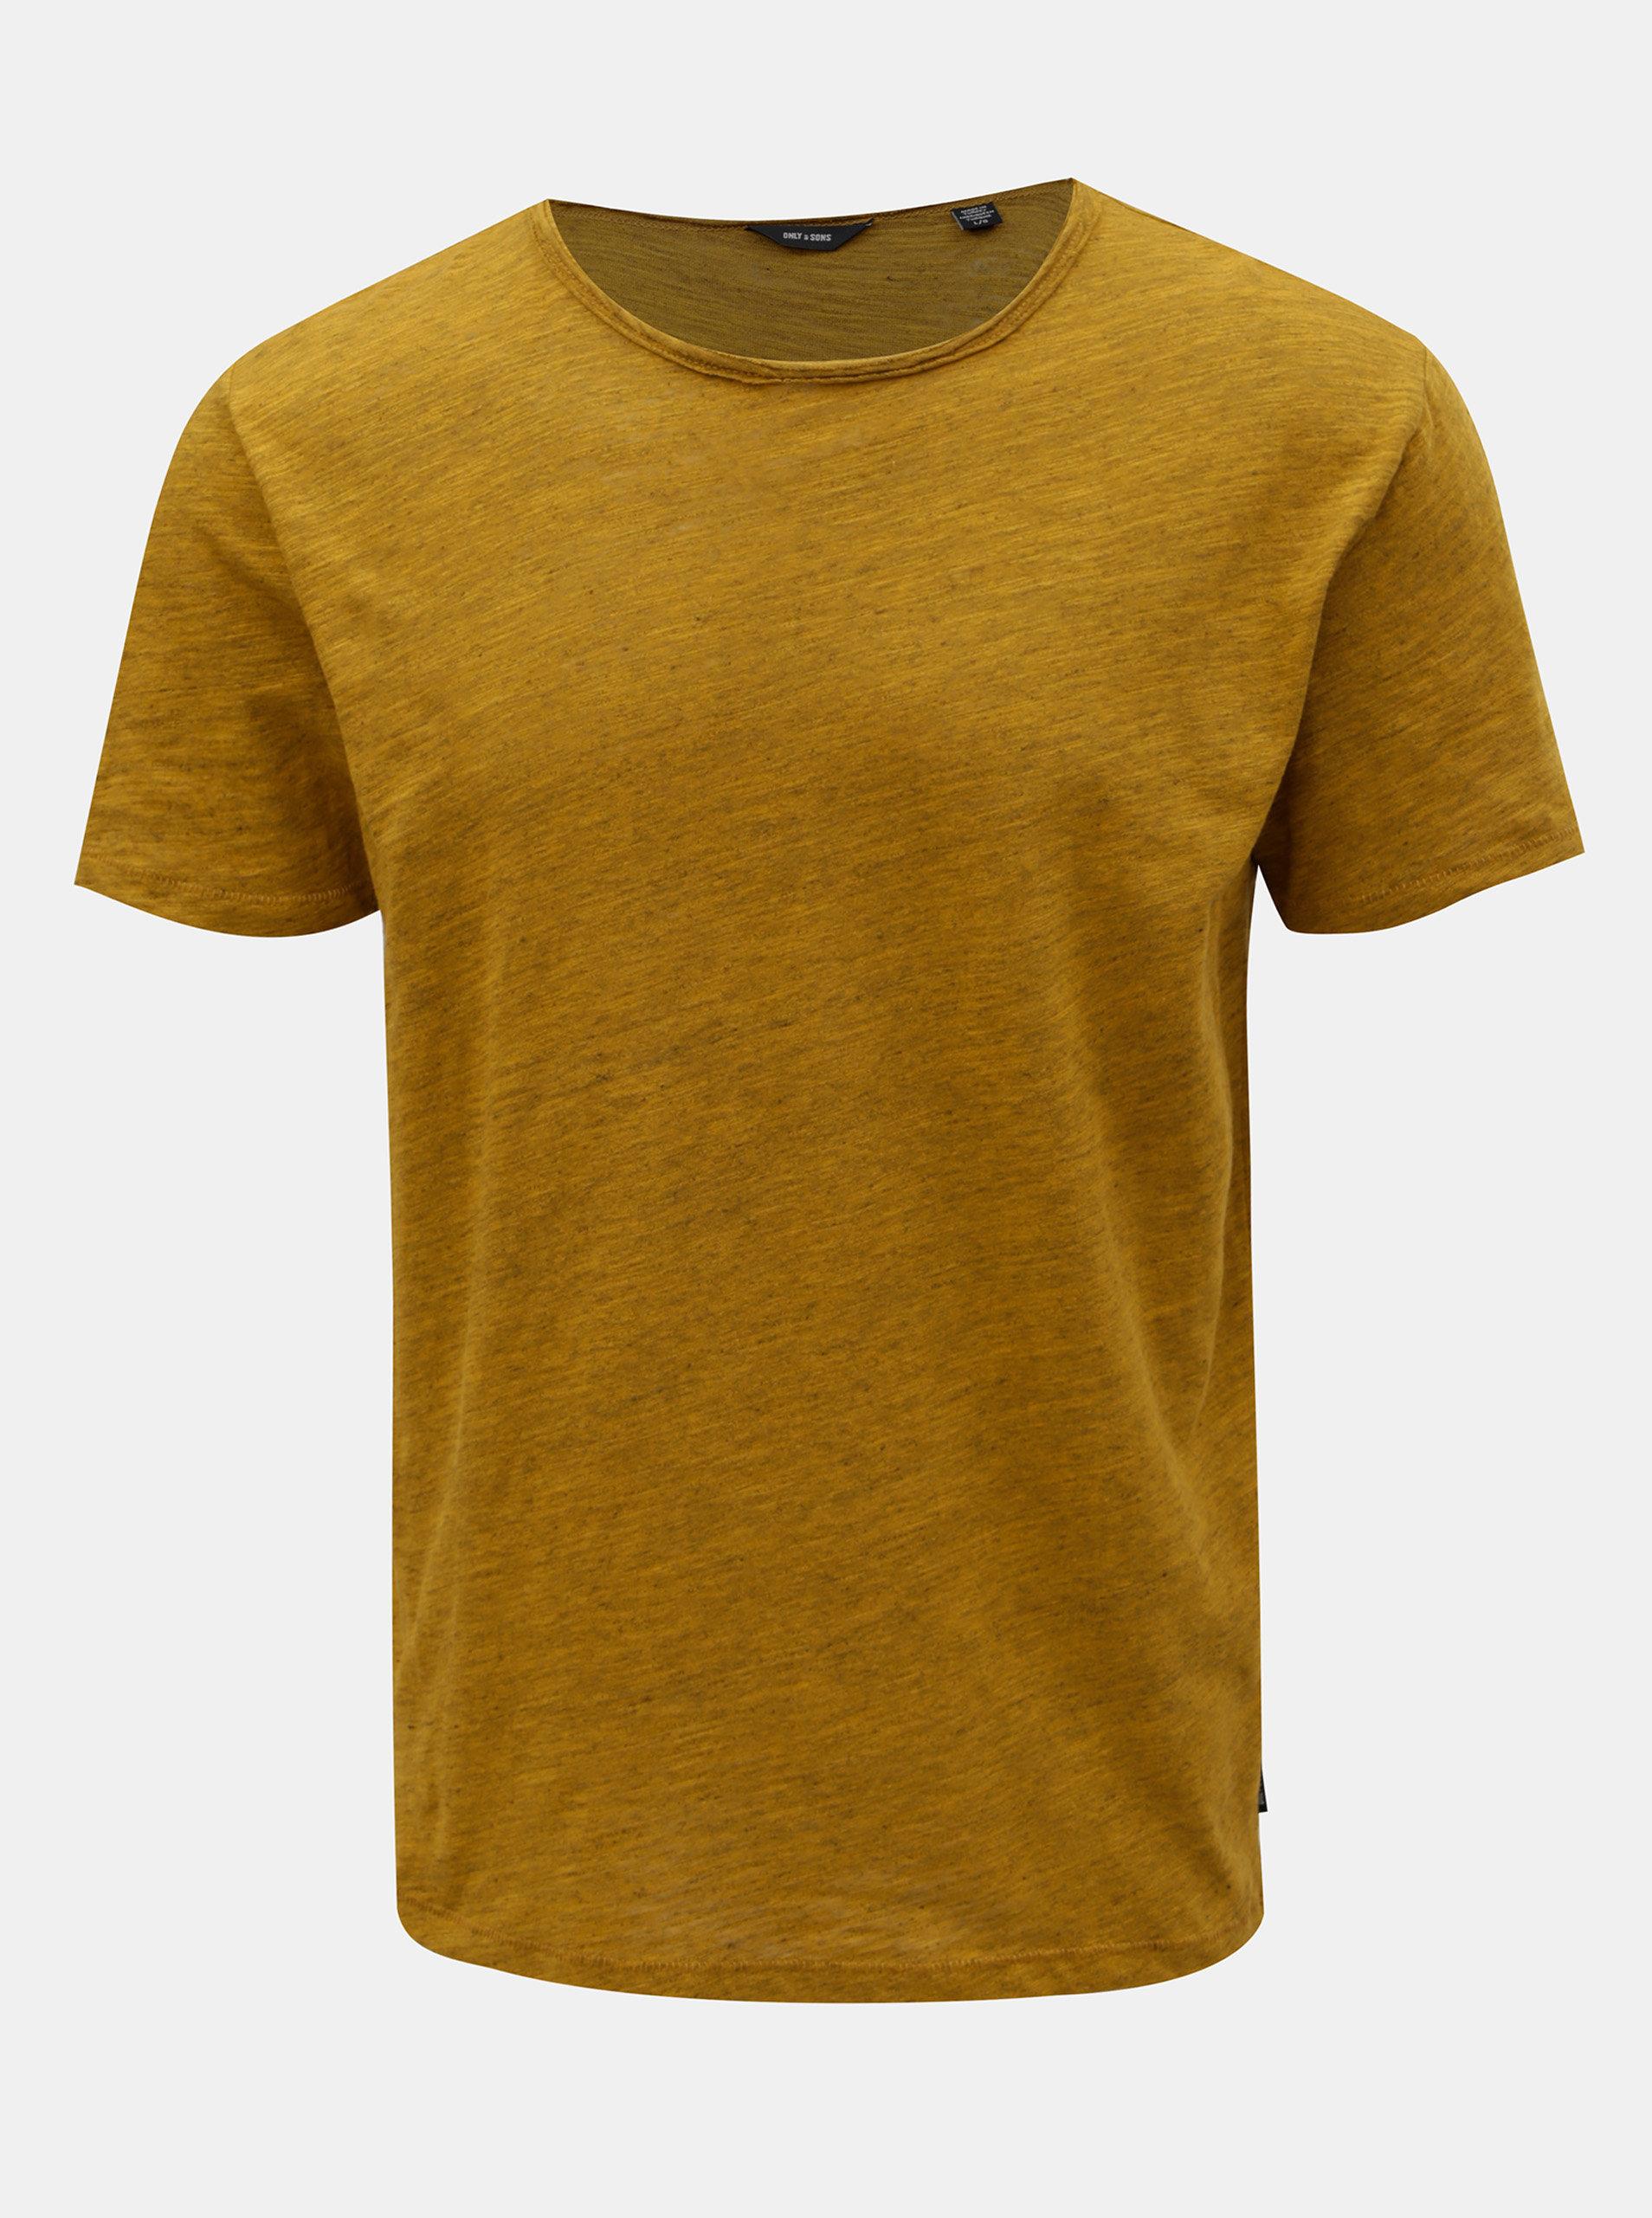 Hořčicové žíhané tričko ONLY & SONS